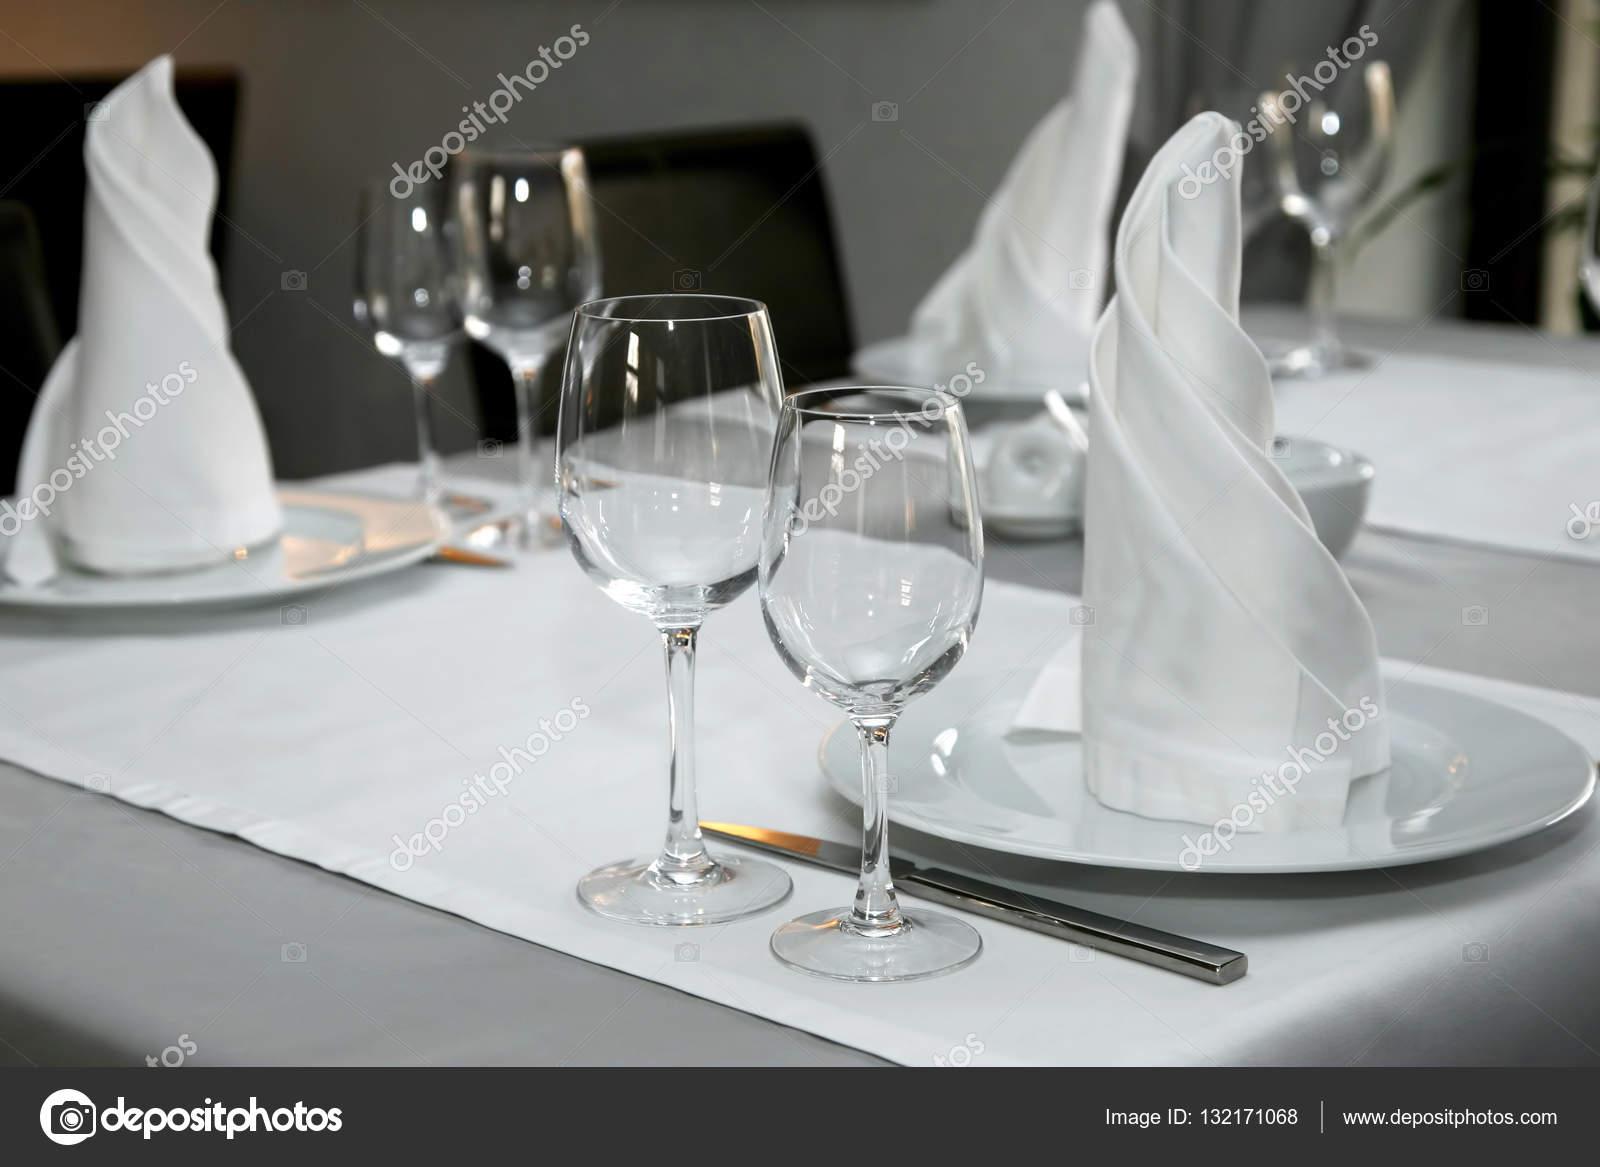 Table setting in restaurant close up \u2014 Stock Photo & table setting in restaurant close up \u2014 Stock Photo © OlegTroino ...